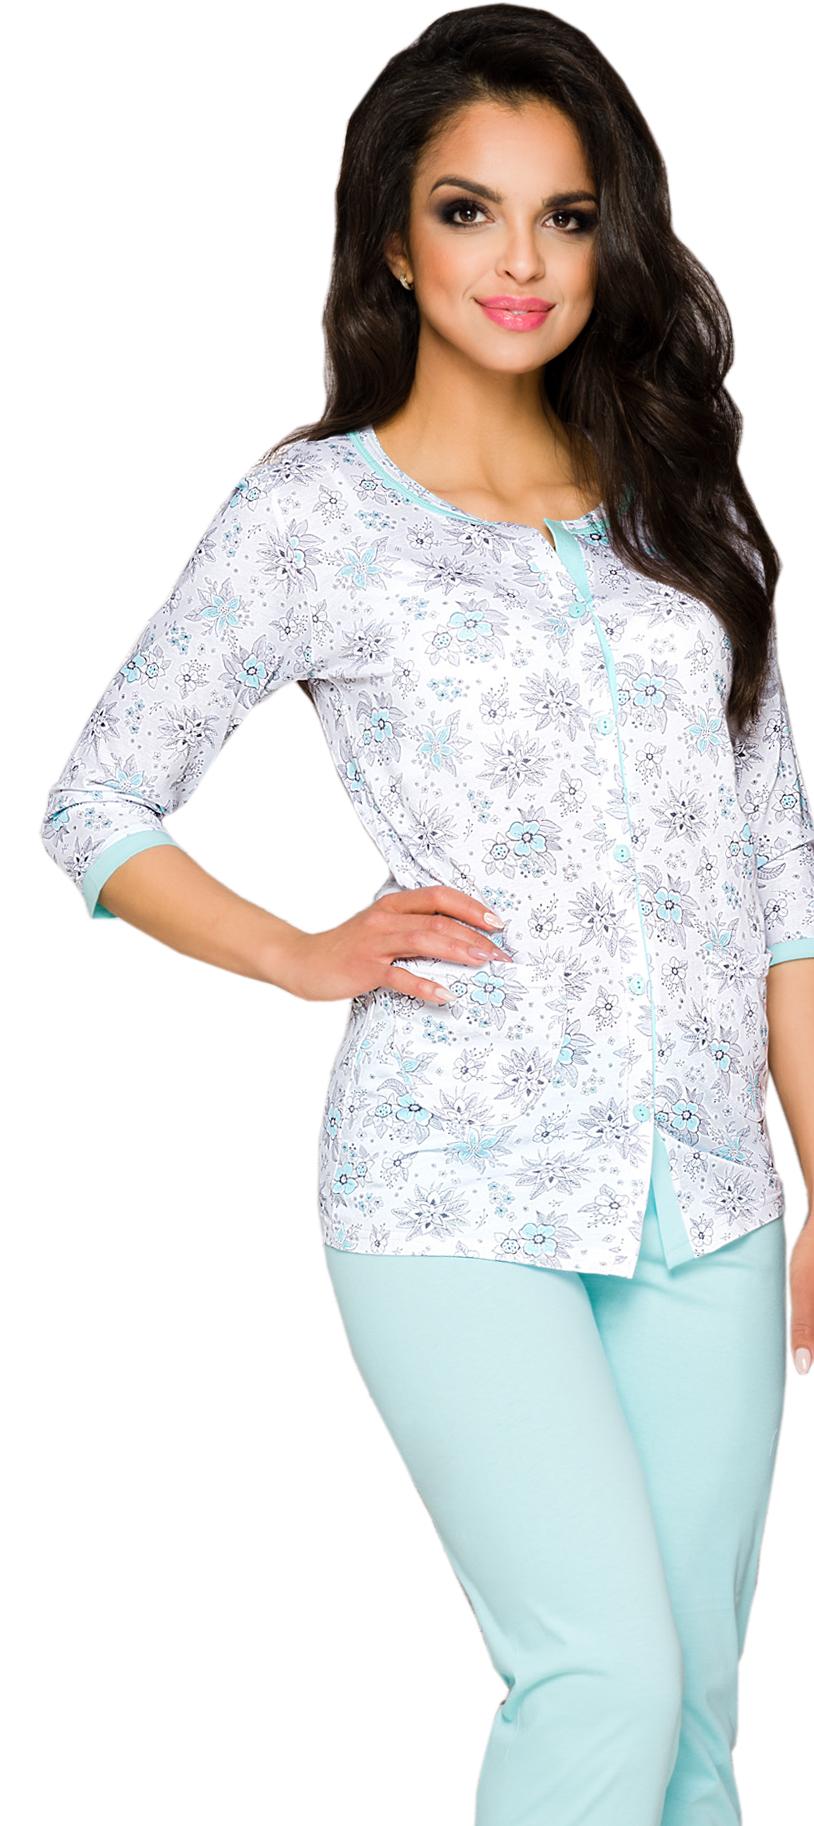 2d44faba70c50c TARO 2122 piżama FABIA wz.1 rozpinana # L 40 - 6995518570 ...